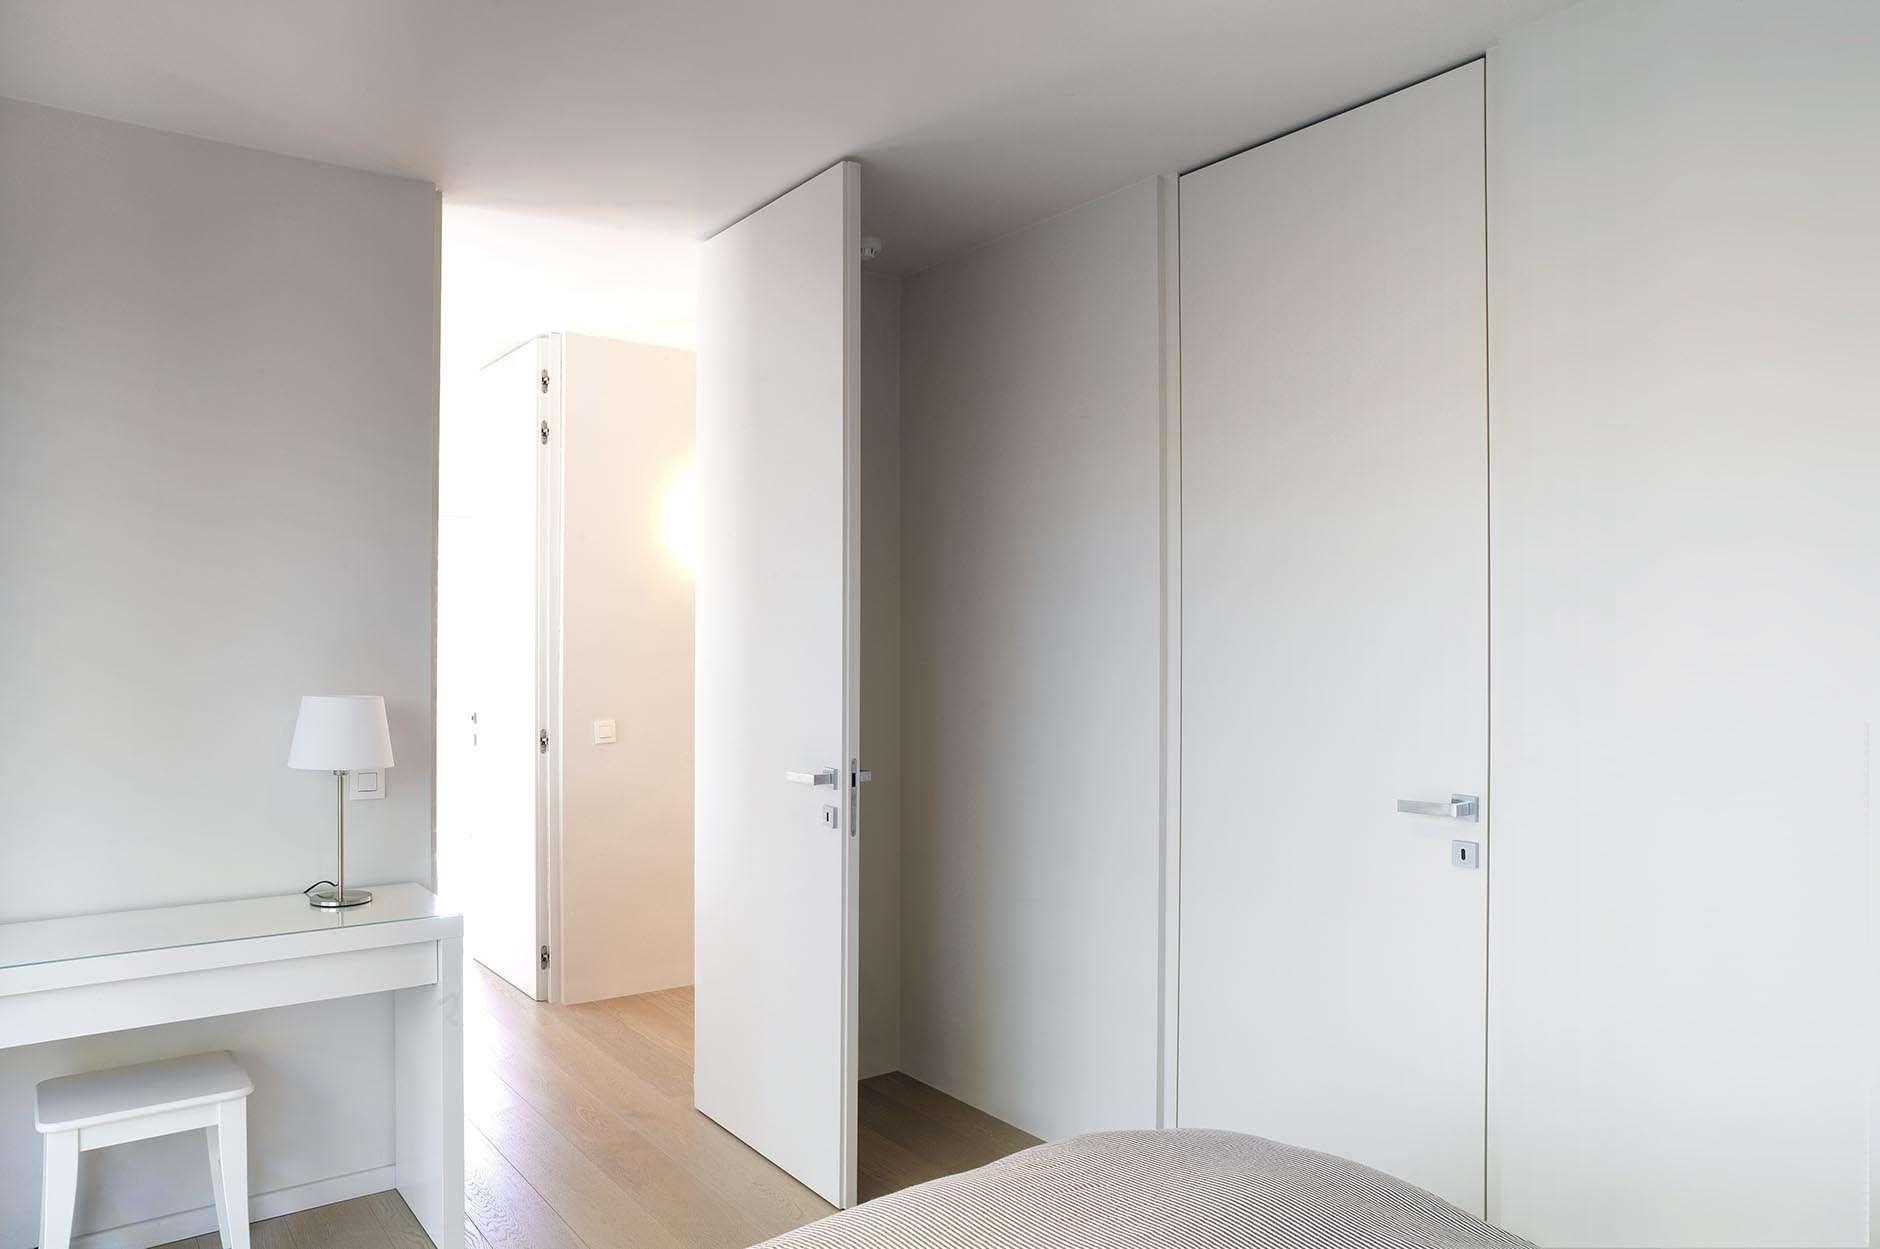 plafondhoge-slaapkamerdeur-nordex